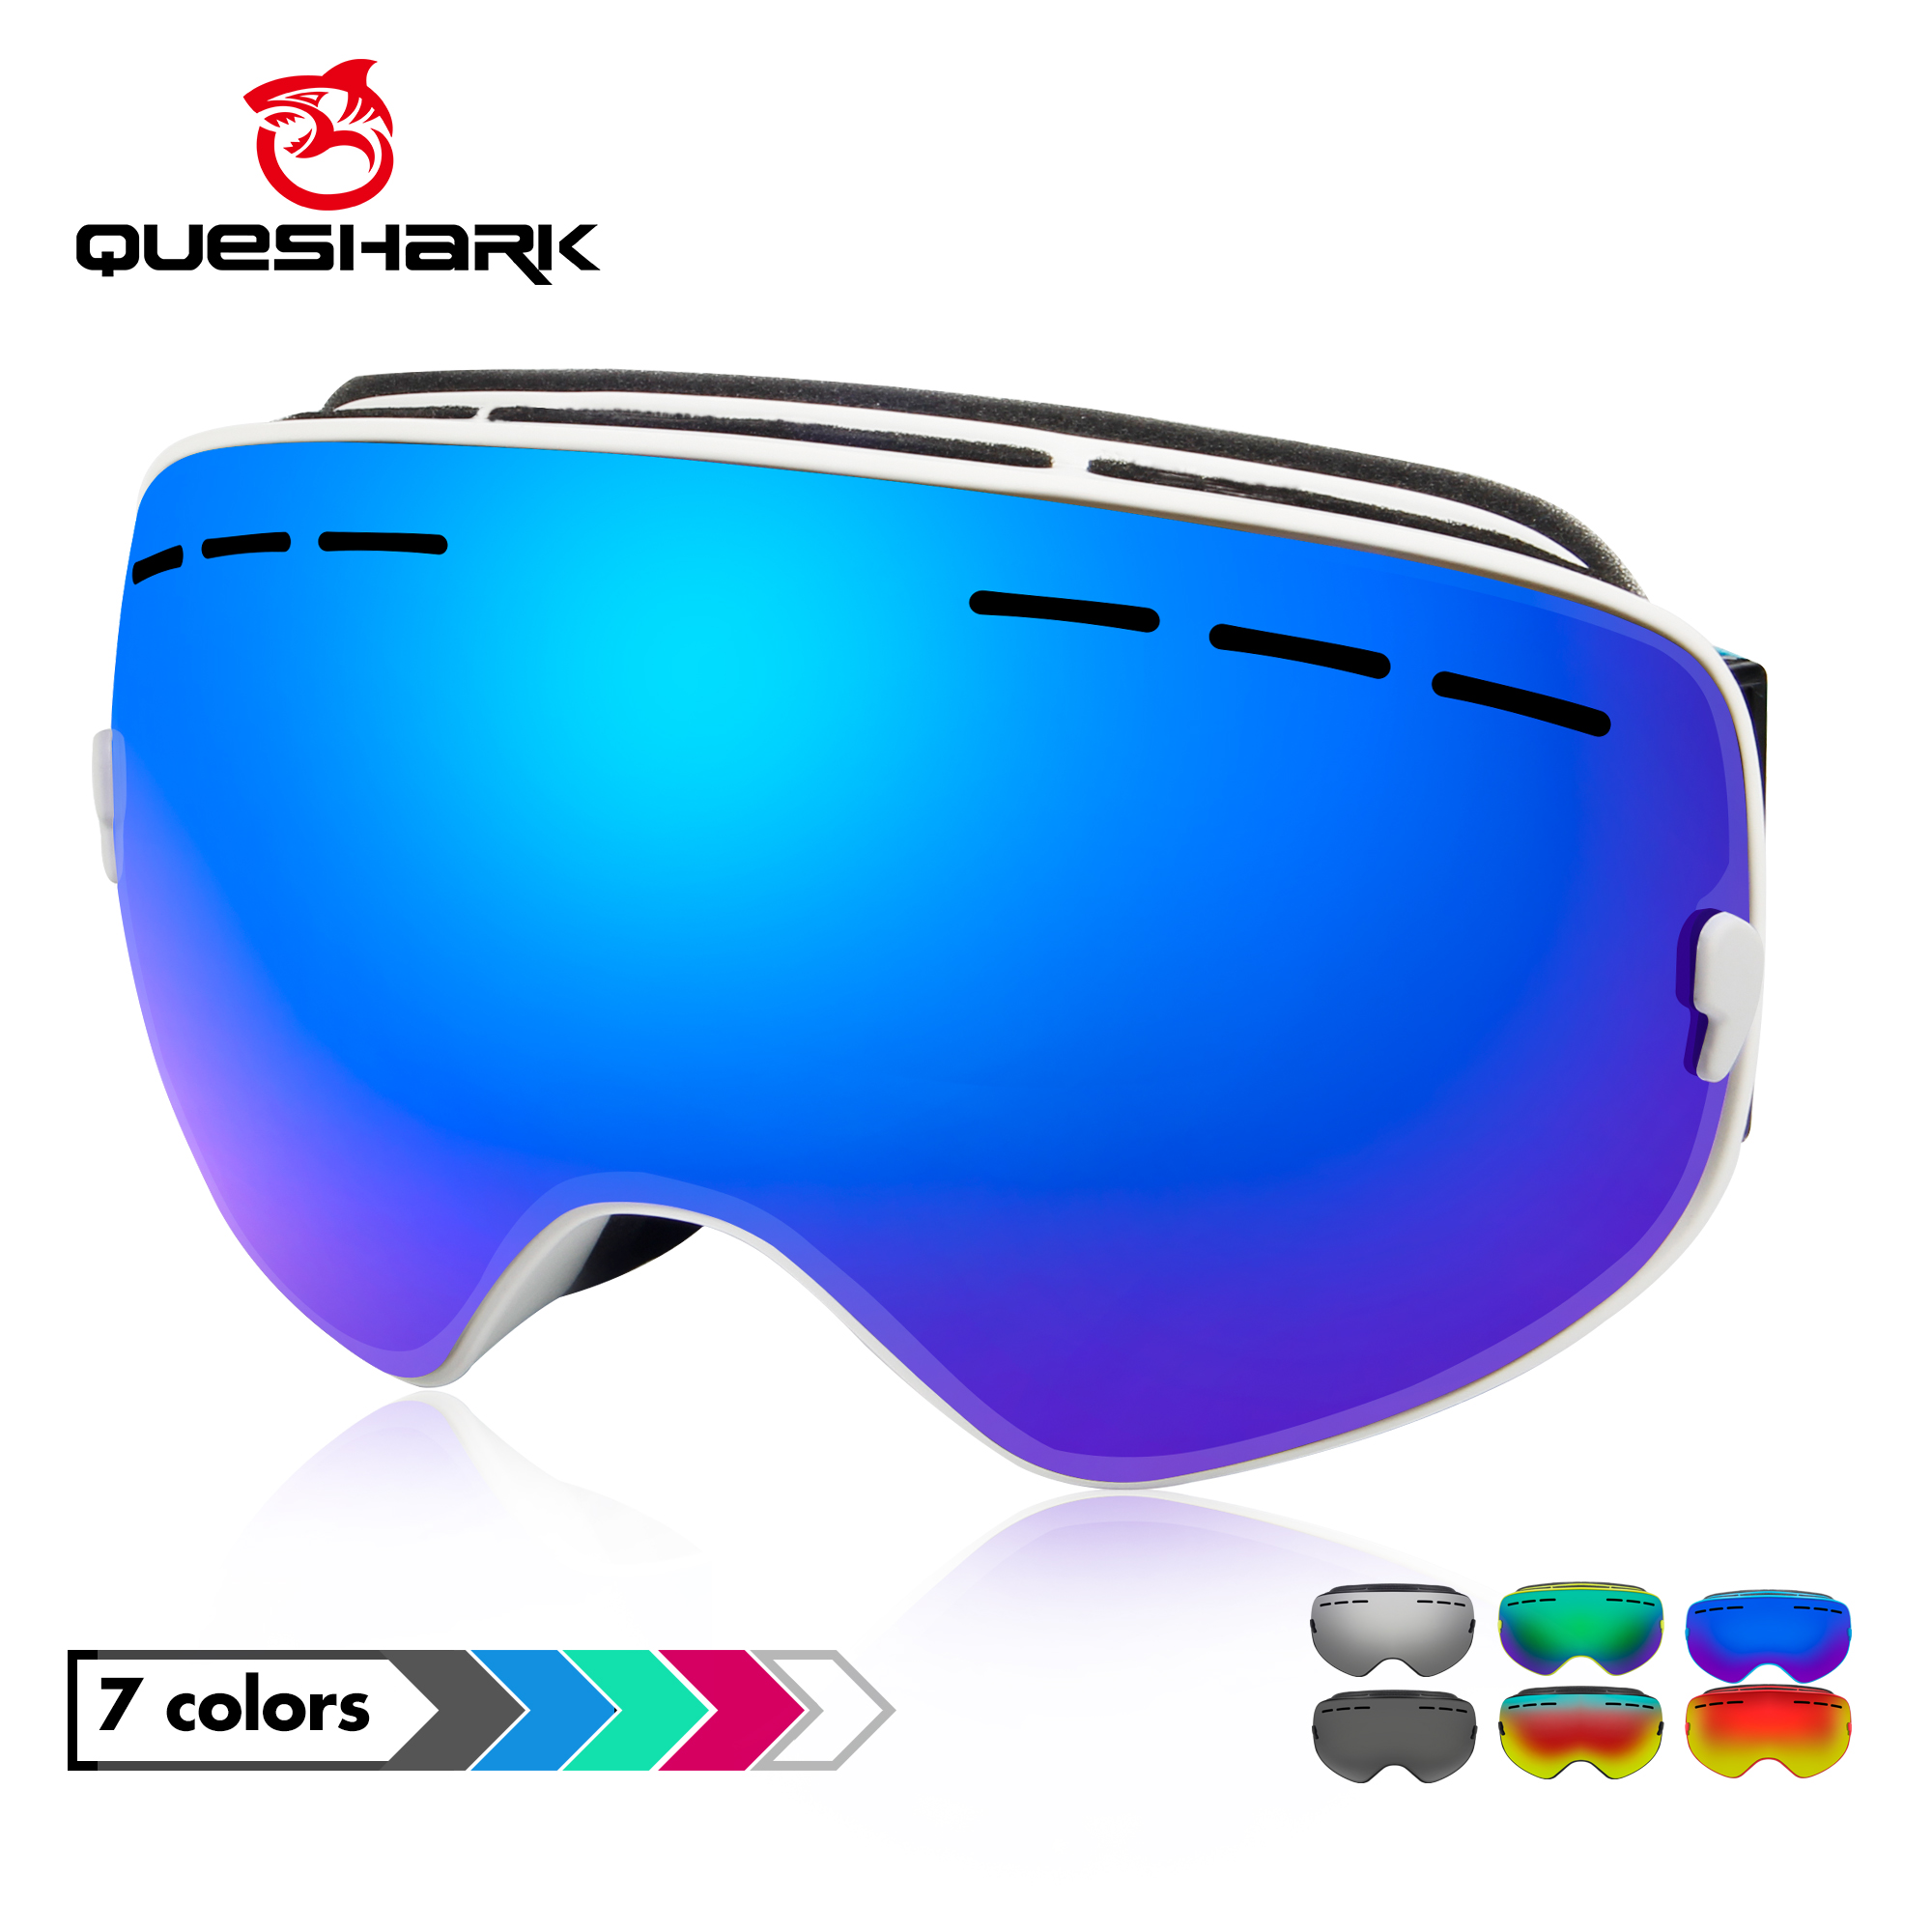 Queshark Ski Goggles Double Layers UV400 Anti-fog Big Ski Mask Glasses Skiing Men Women Snow Snowboard Goggles